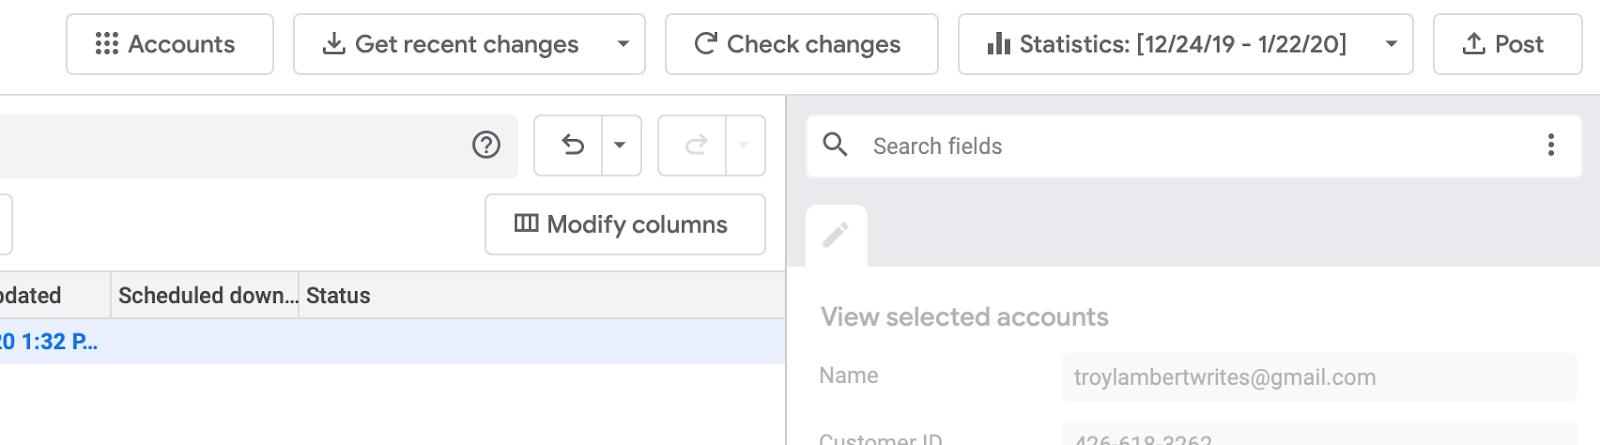 Posting Changes Google Ads Editor